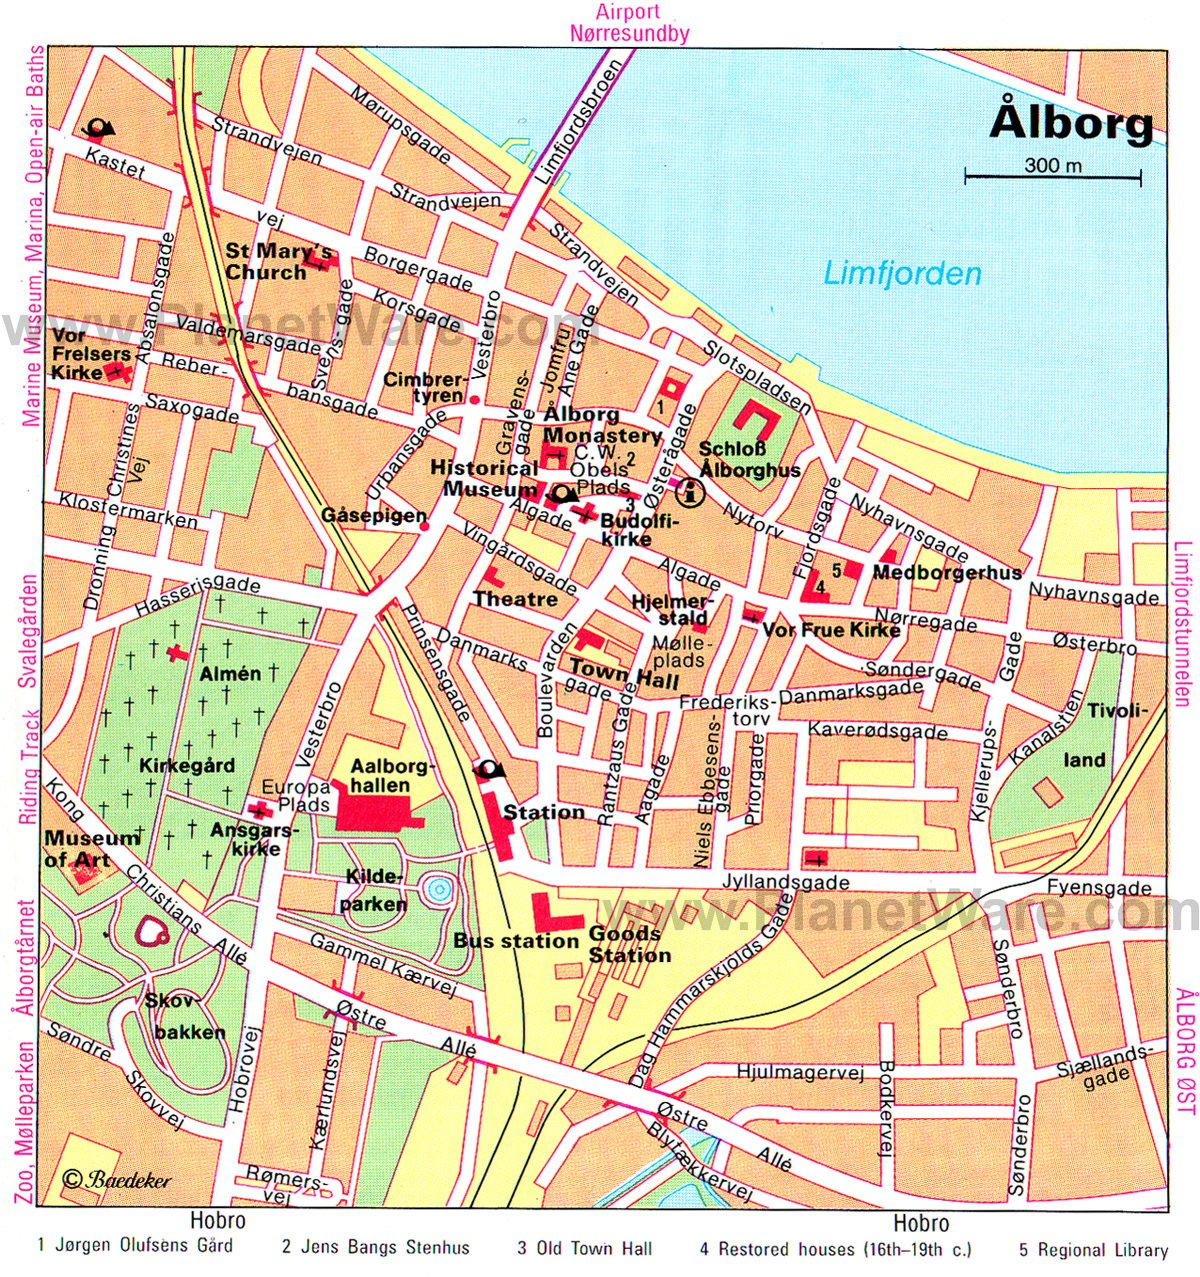 Aalborg Denmark Cruise Port of Call